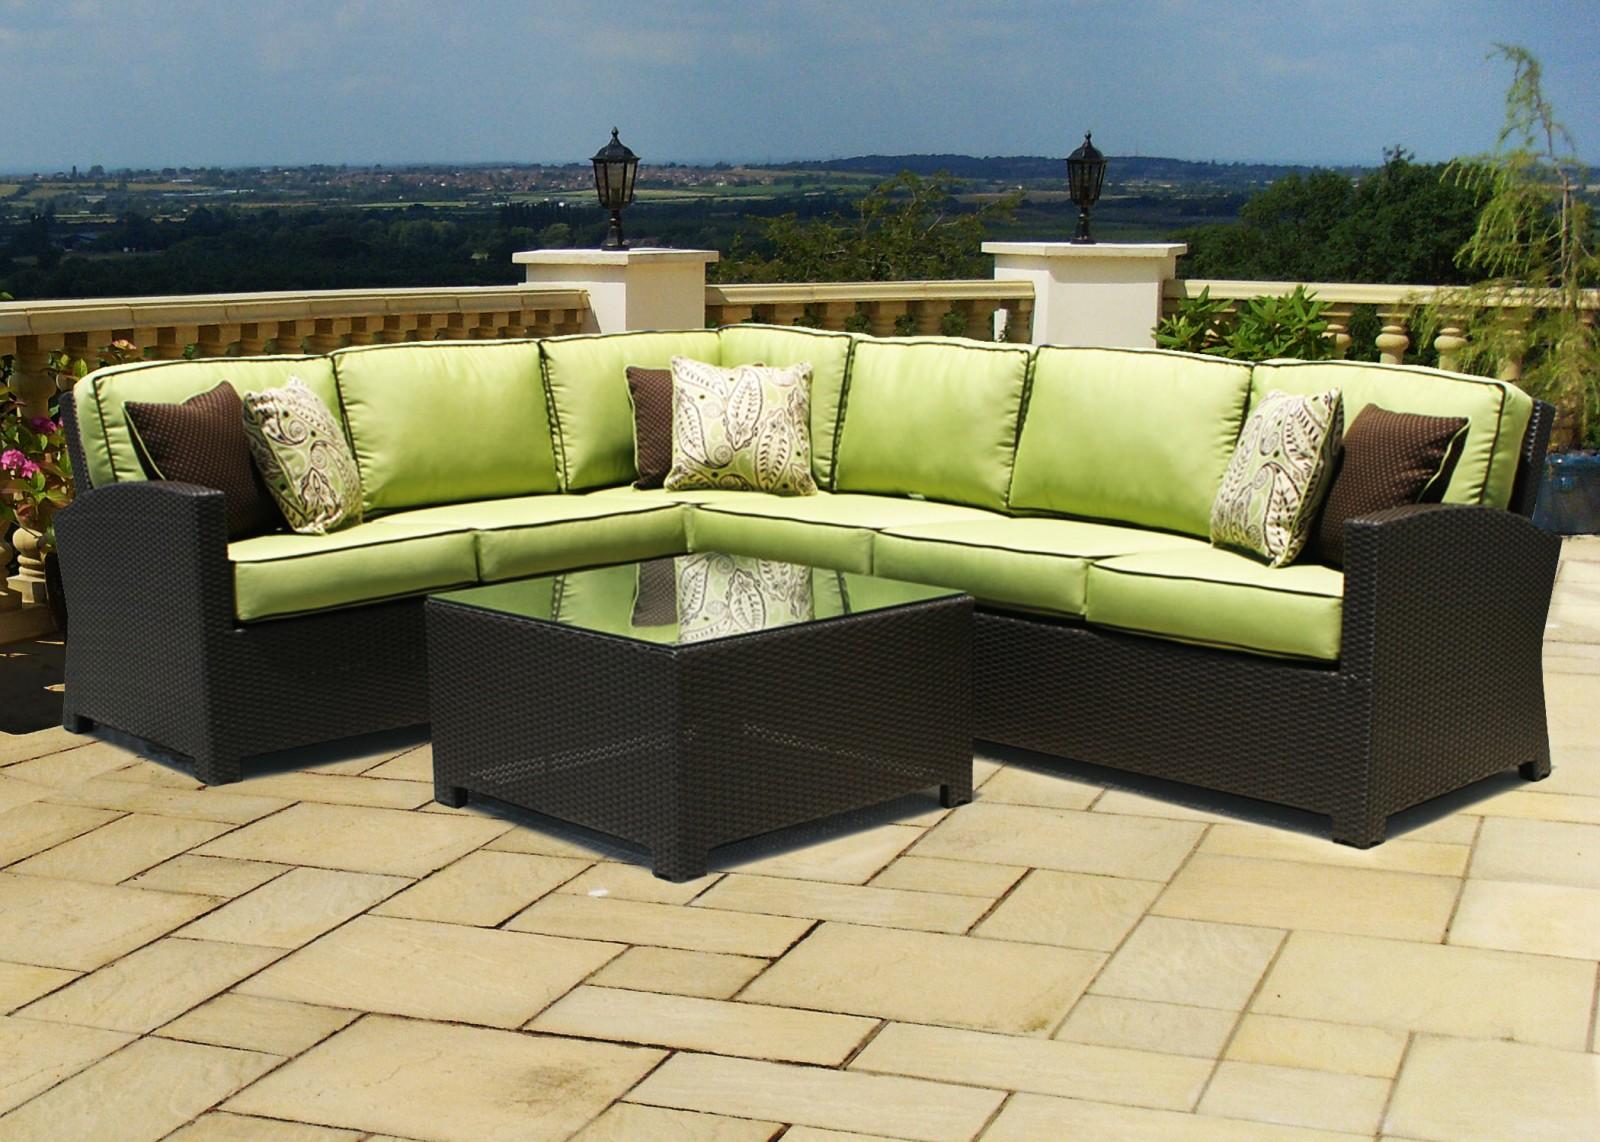 Terrific Outdoor Sectional Seating Patio Furniture Heat N Sweep Cjindustries Chair Design For Home Cjindustriesco